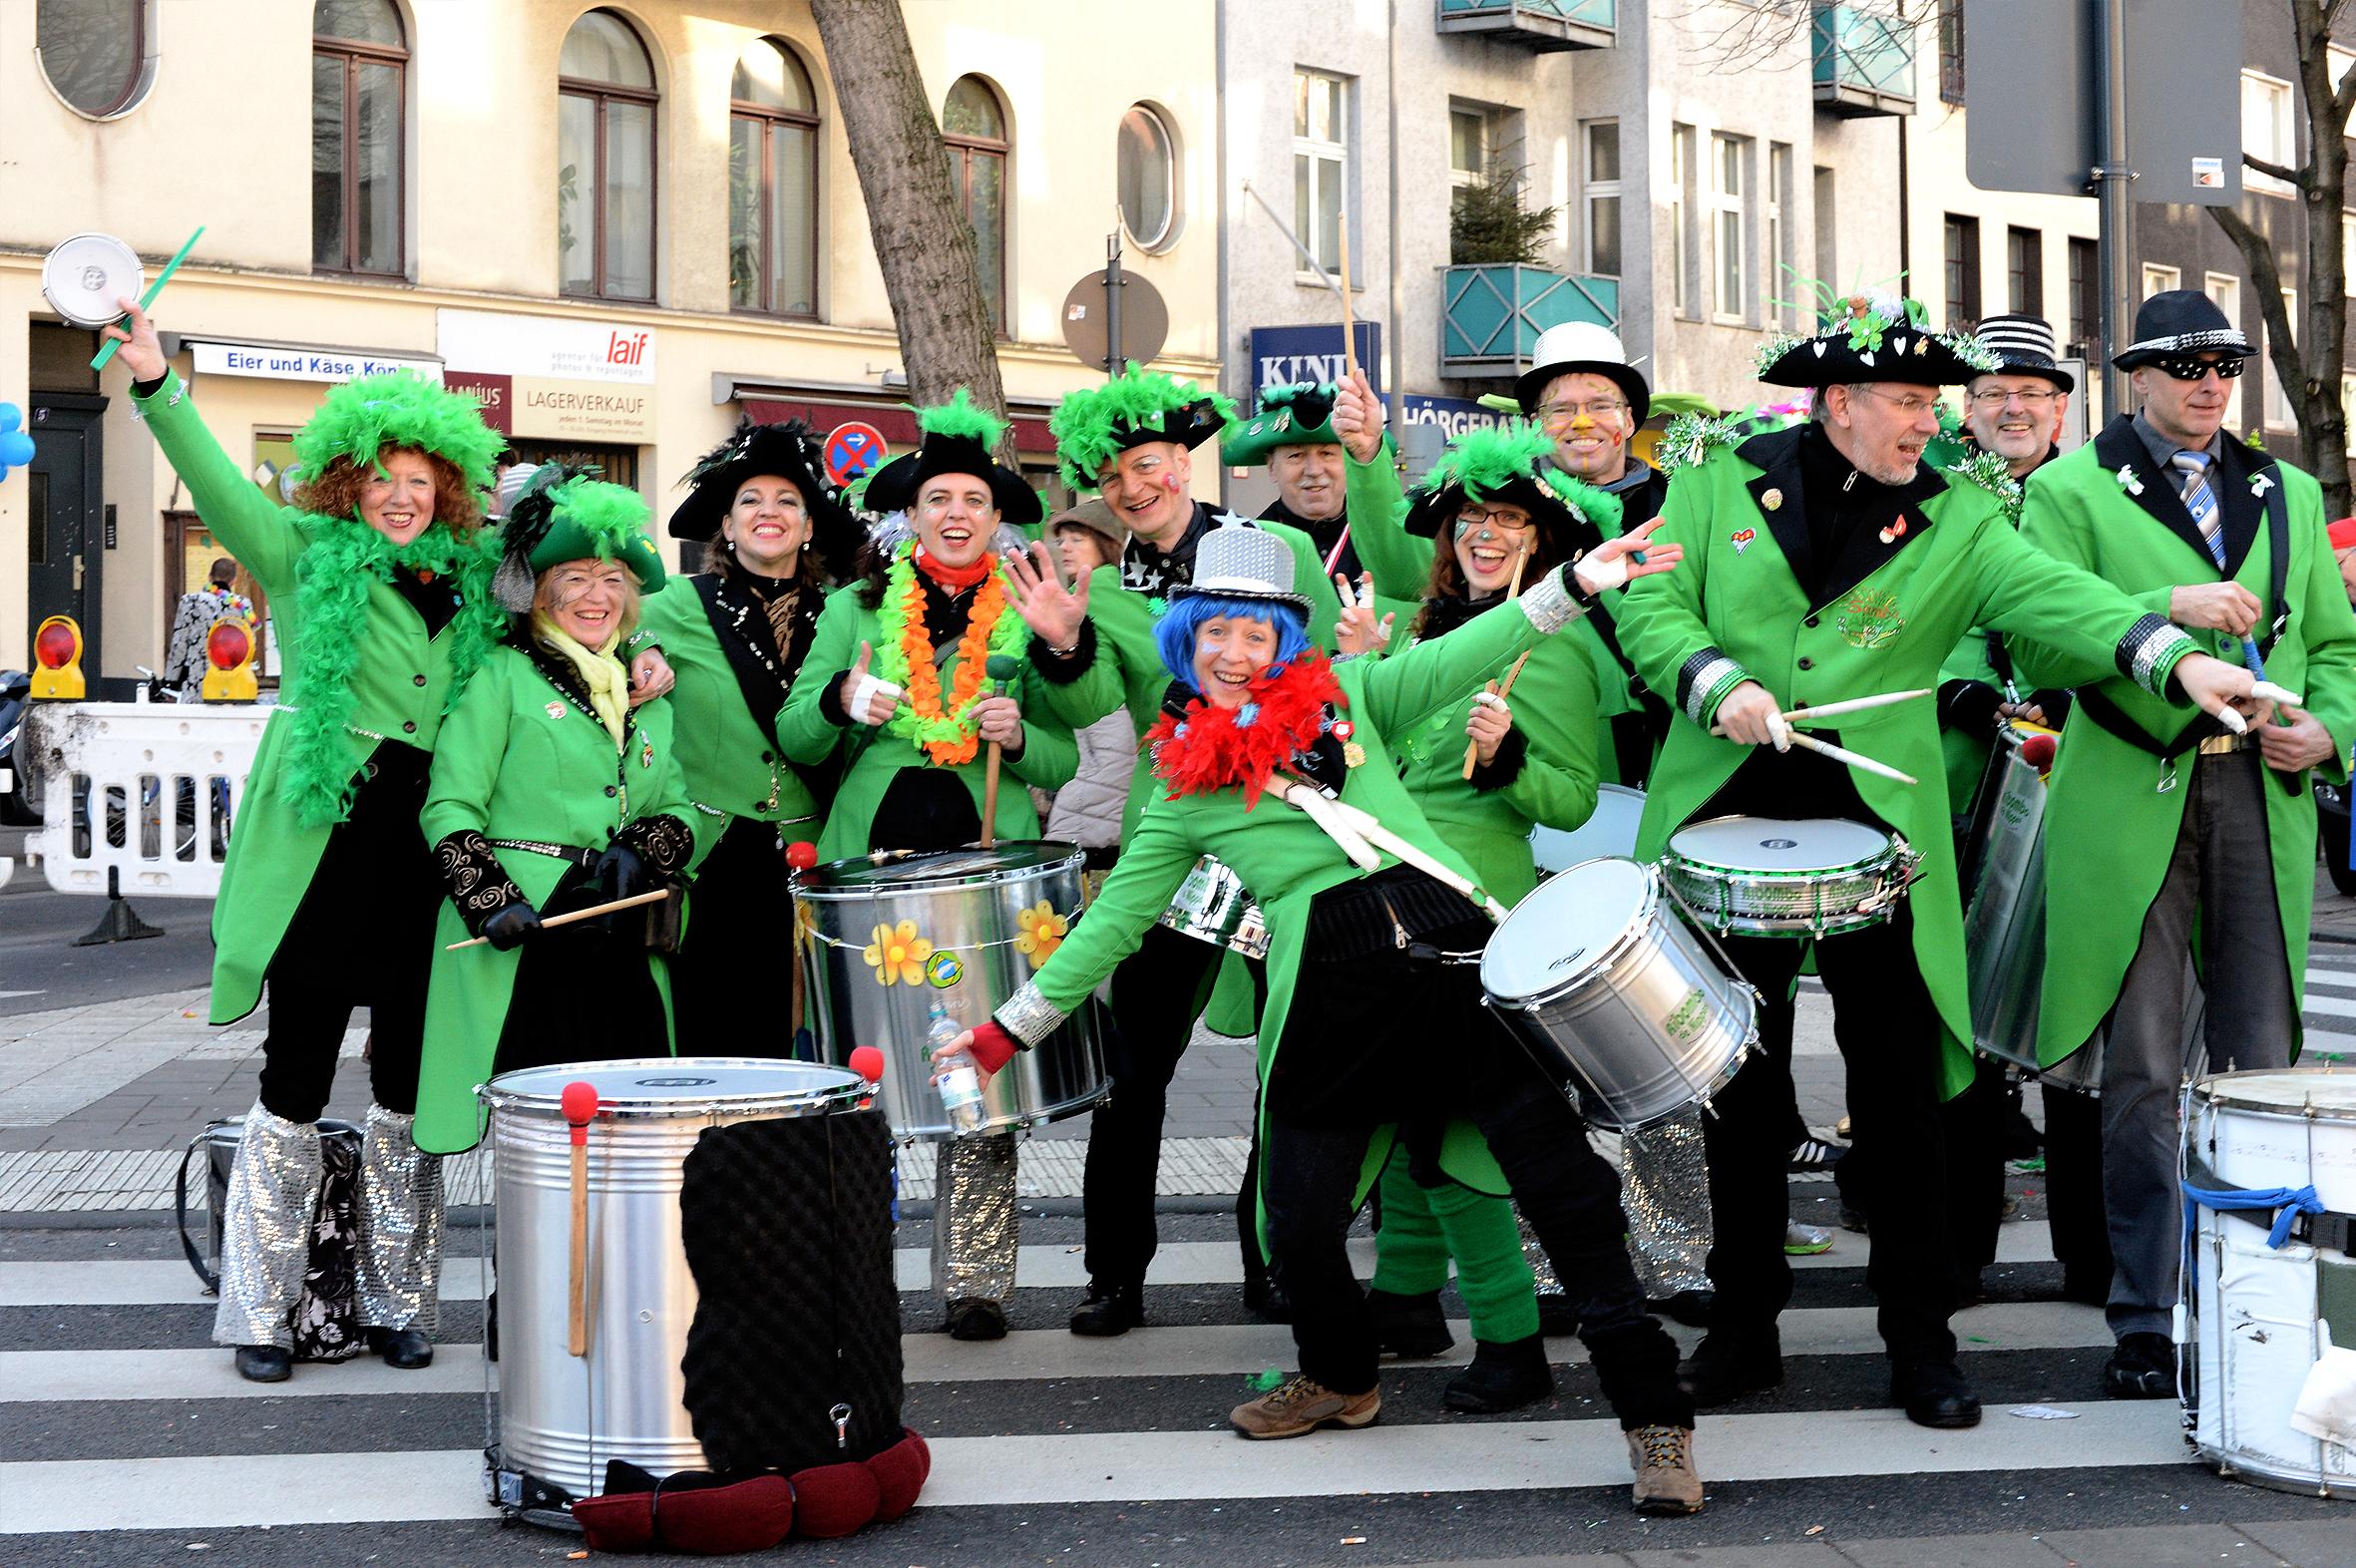 suedstadt_15feb_karneval_2_foto-gerhard-richter2